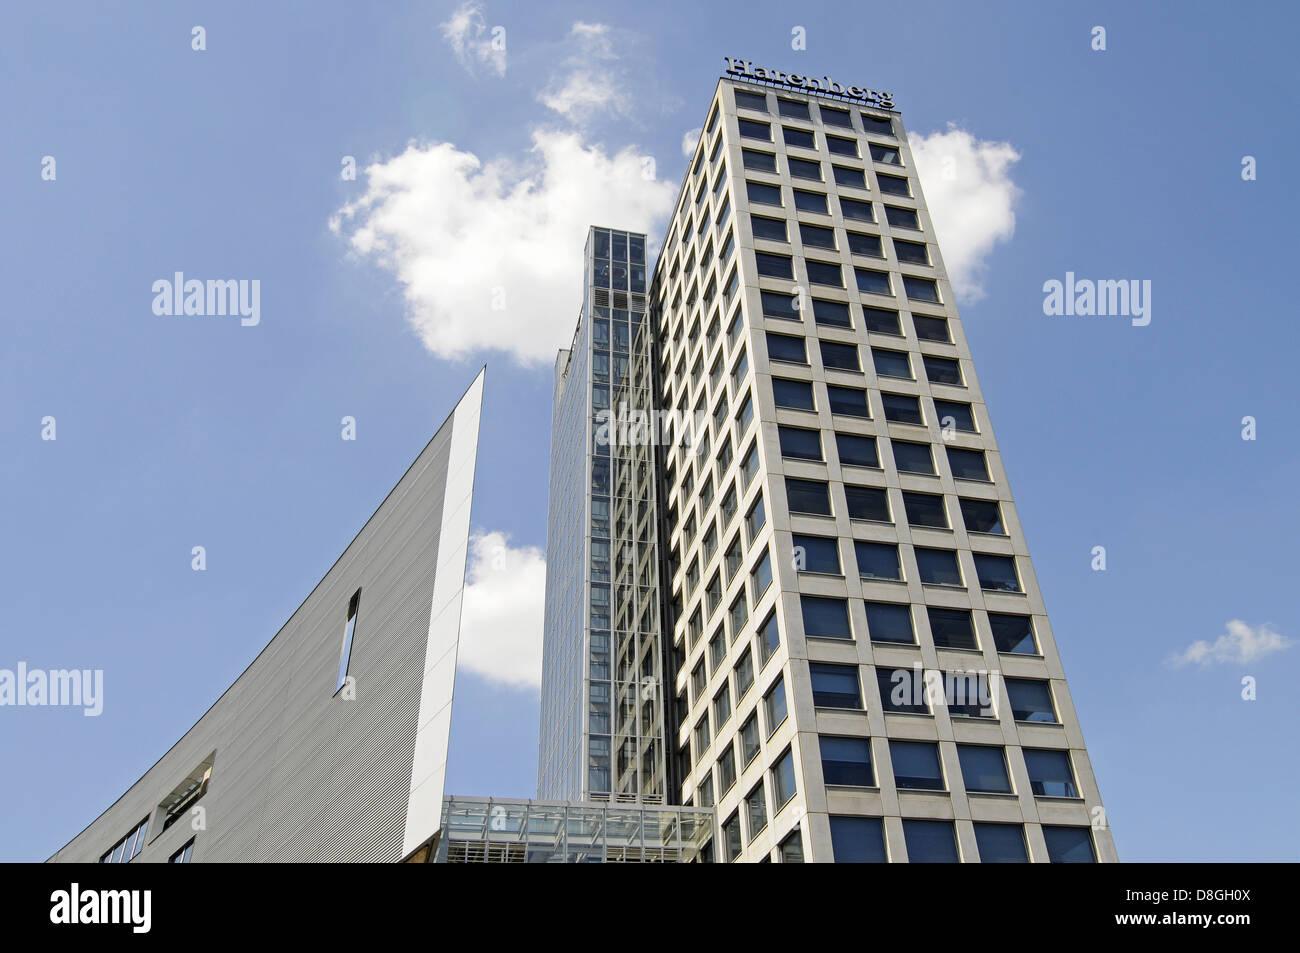 Harenberg City Center - Stock Image